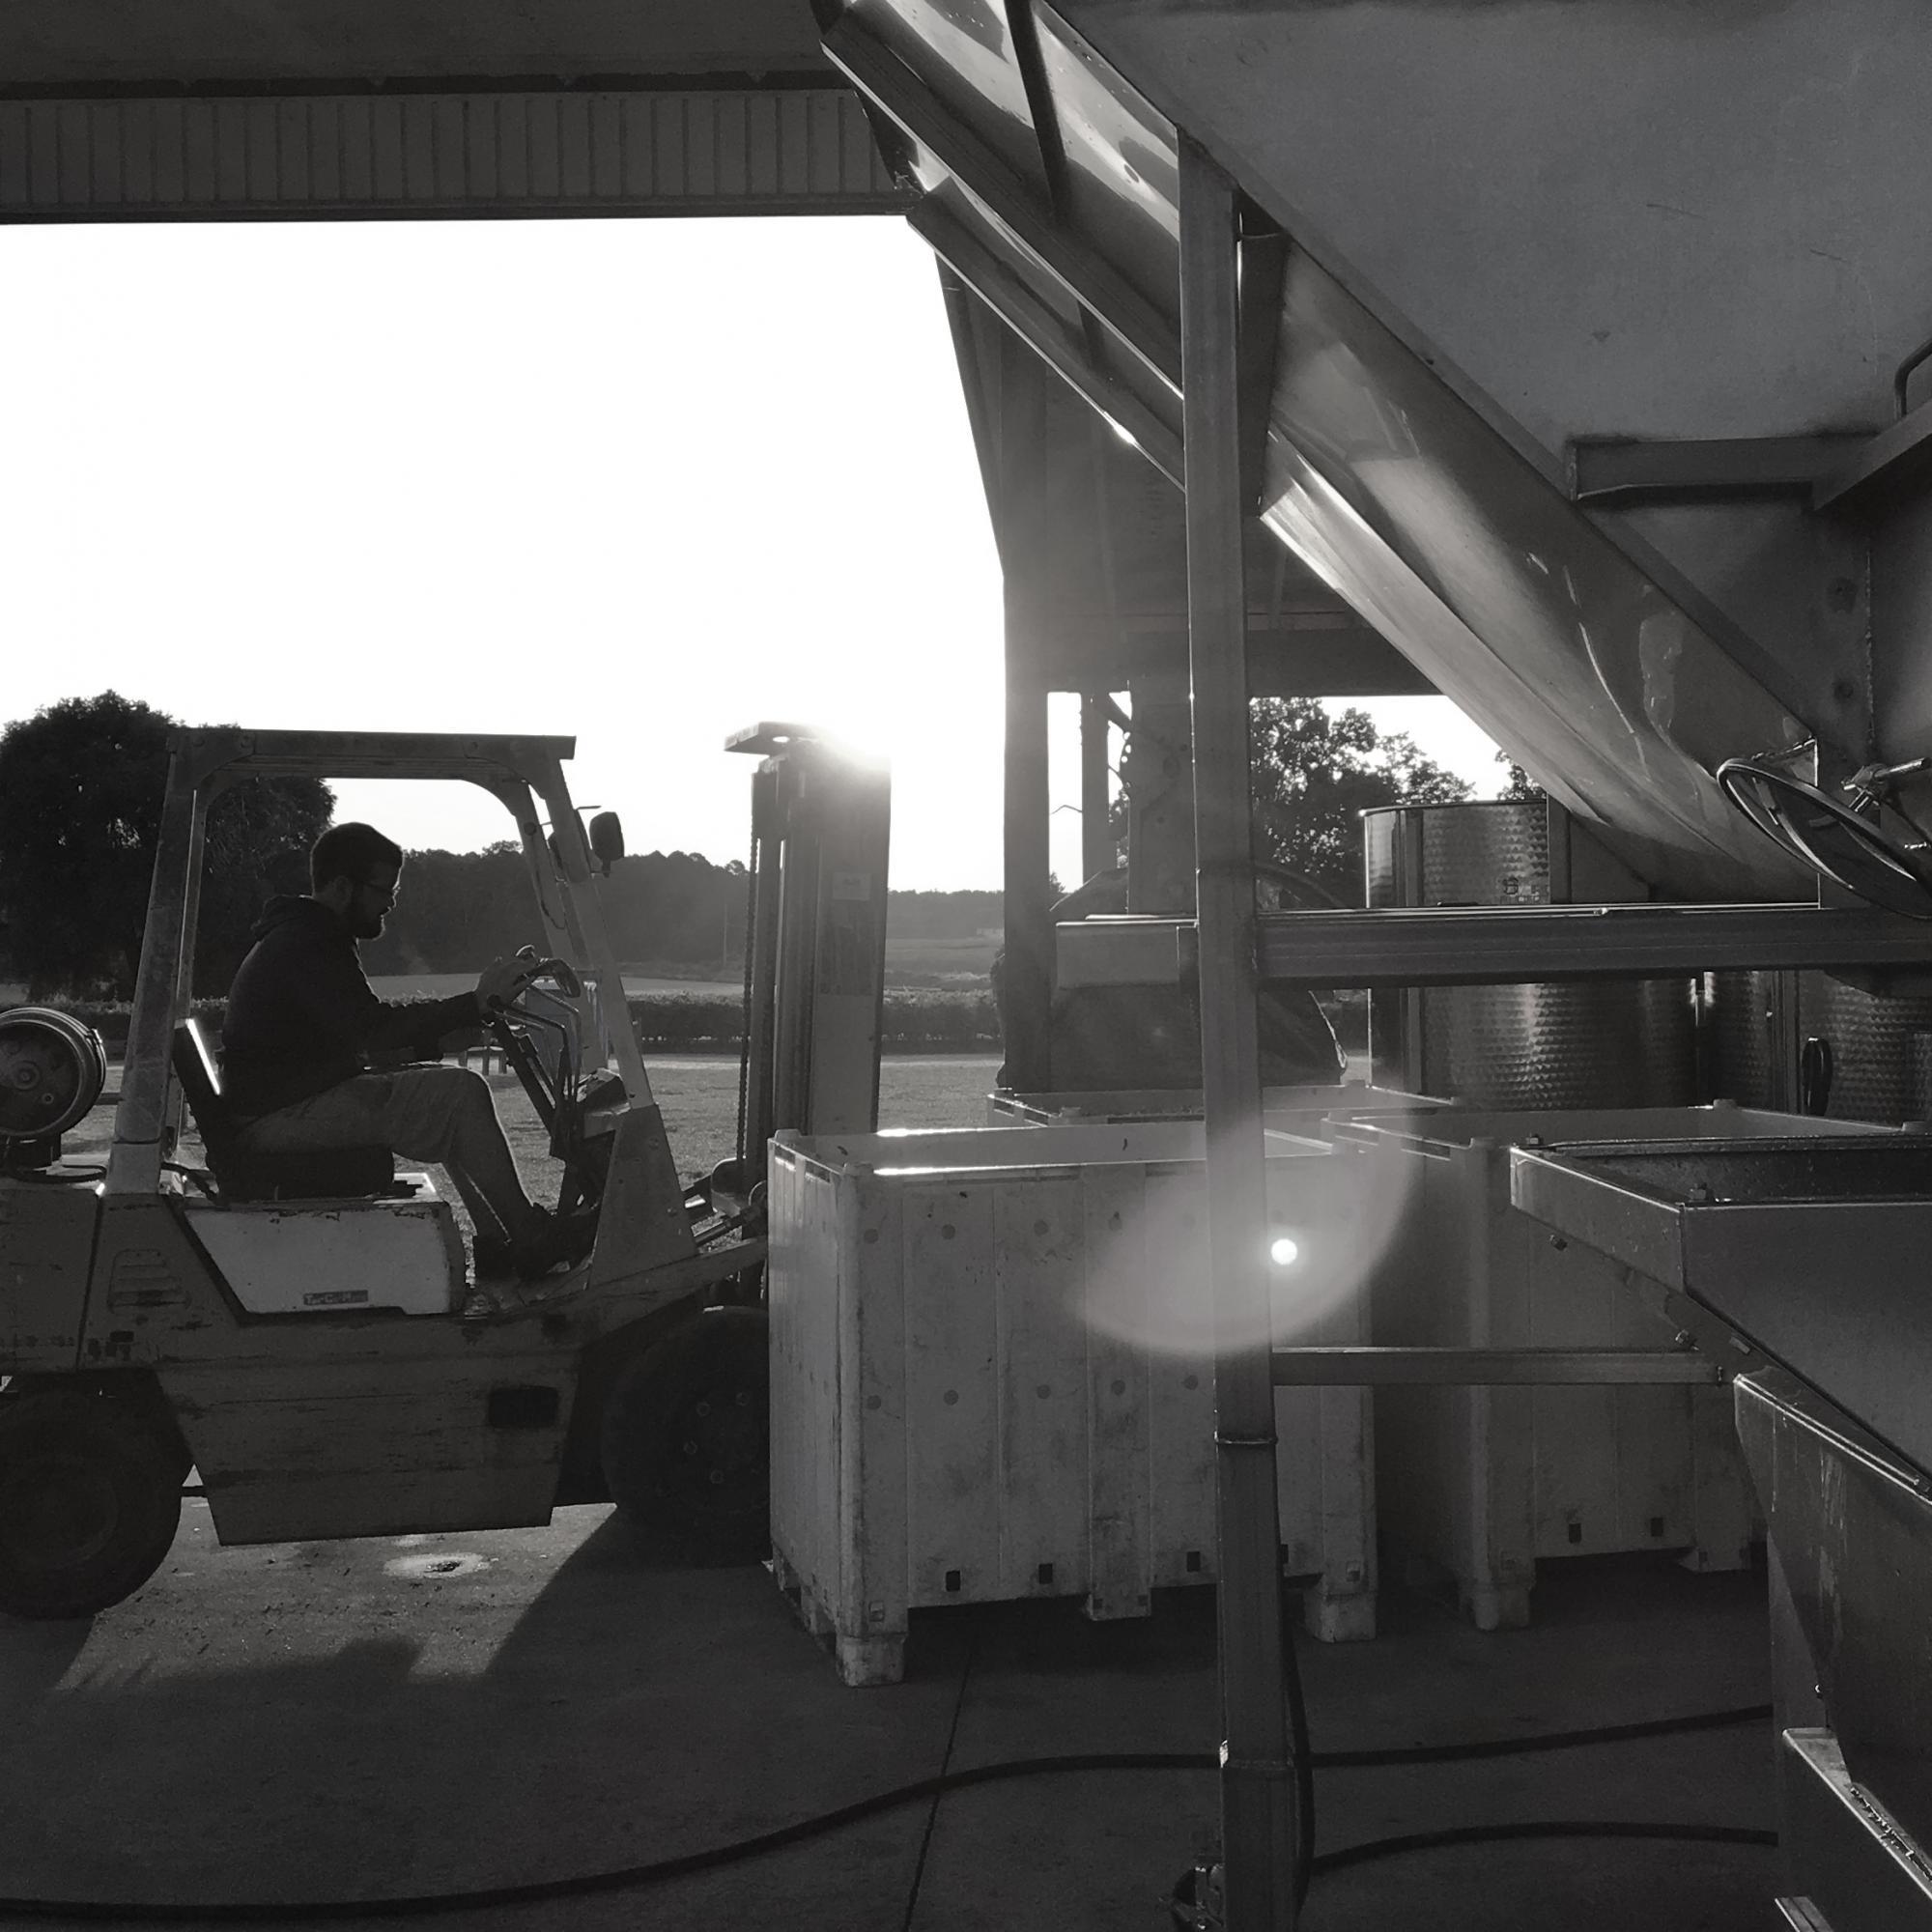 ForkliftBW